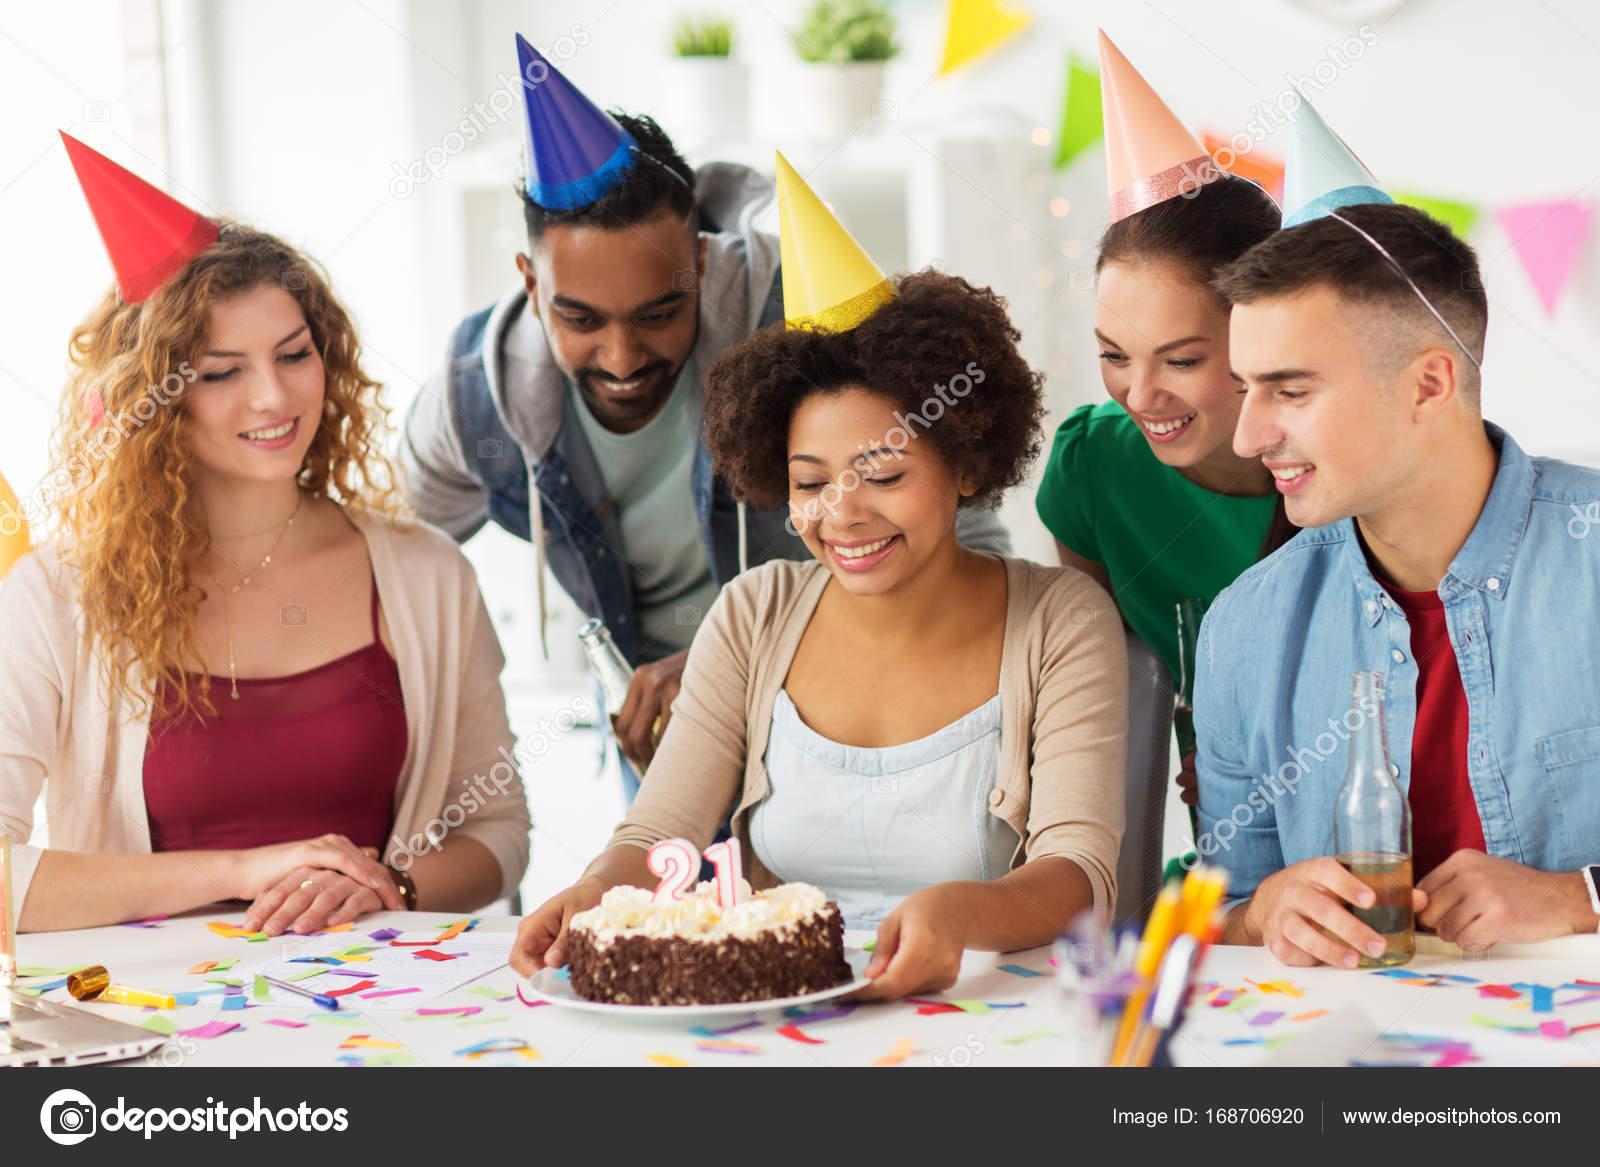 Gruss Teamkollegen Bei Buro Geburtstags Party Stockfoto